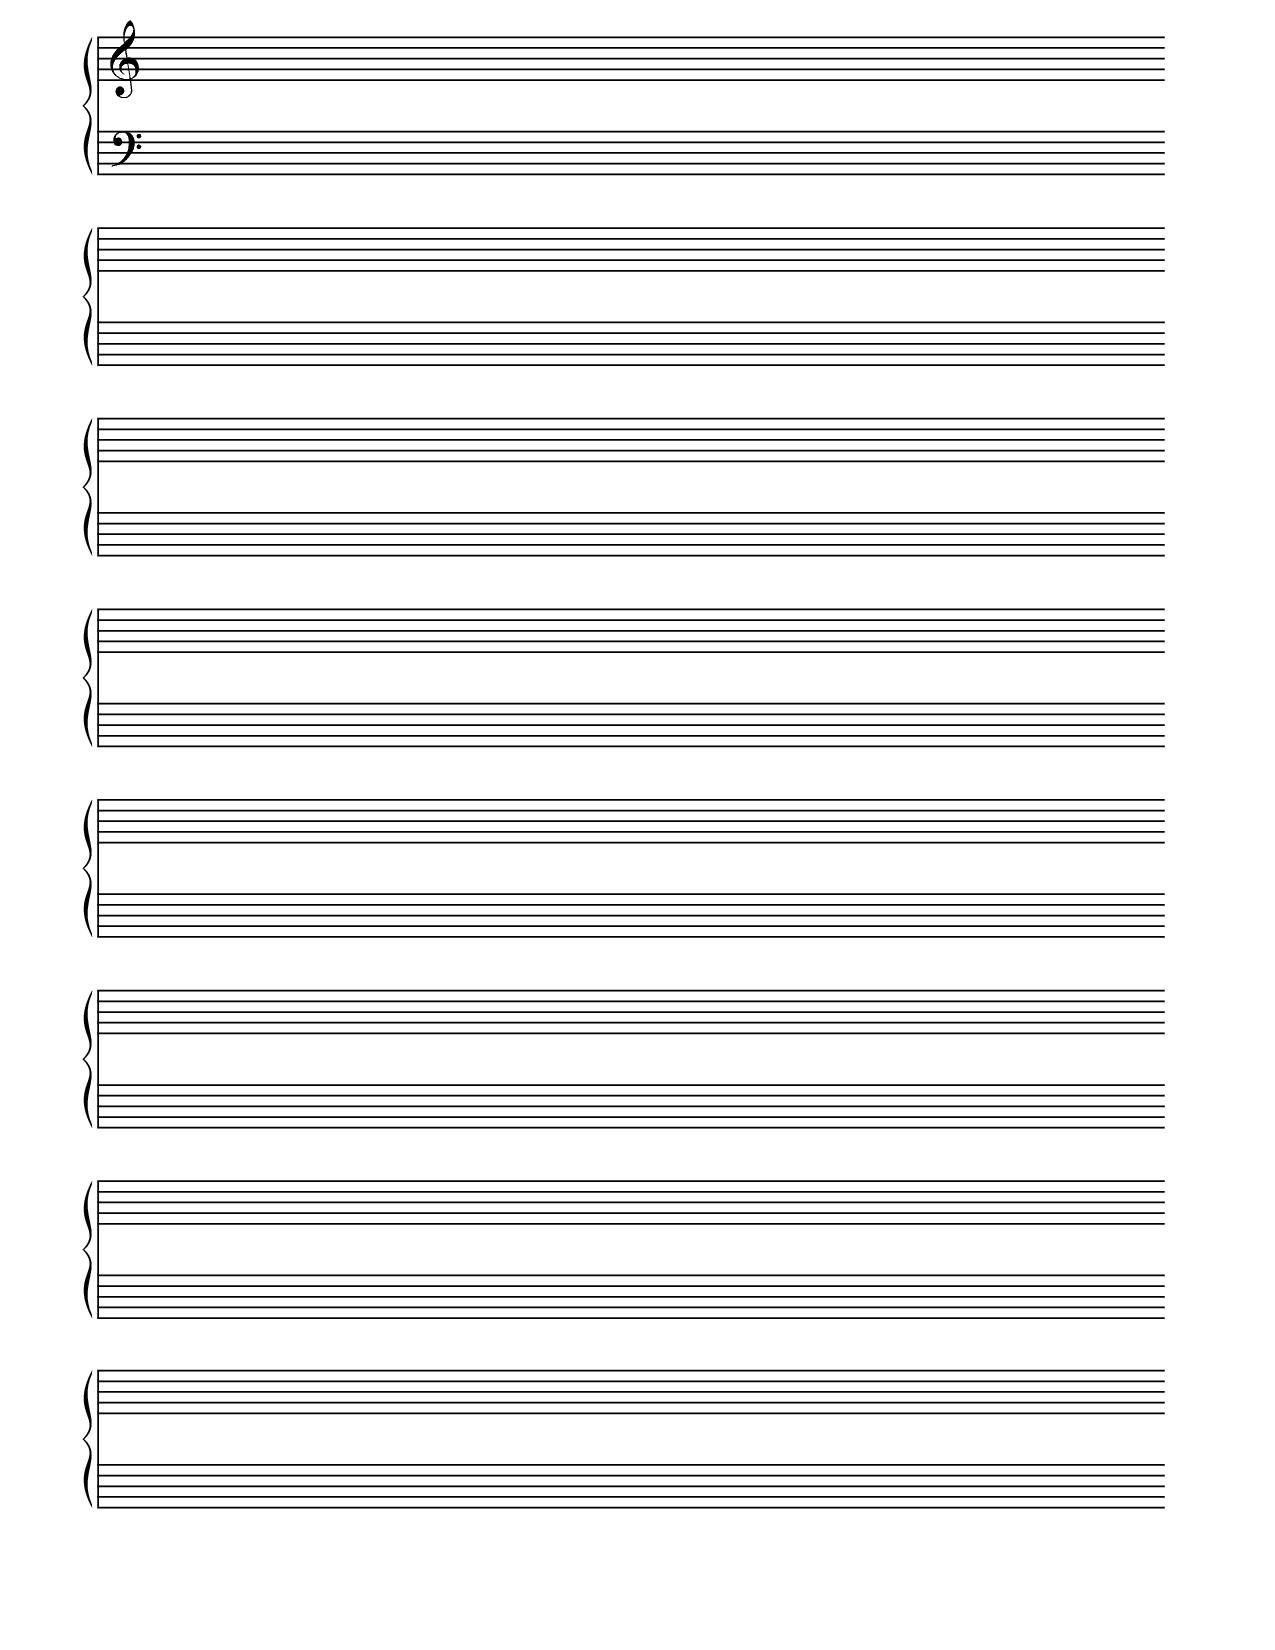 Printable Blank Piano Sheet Music Paper